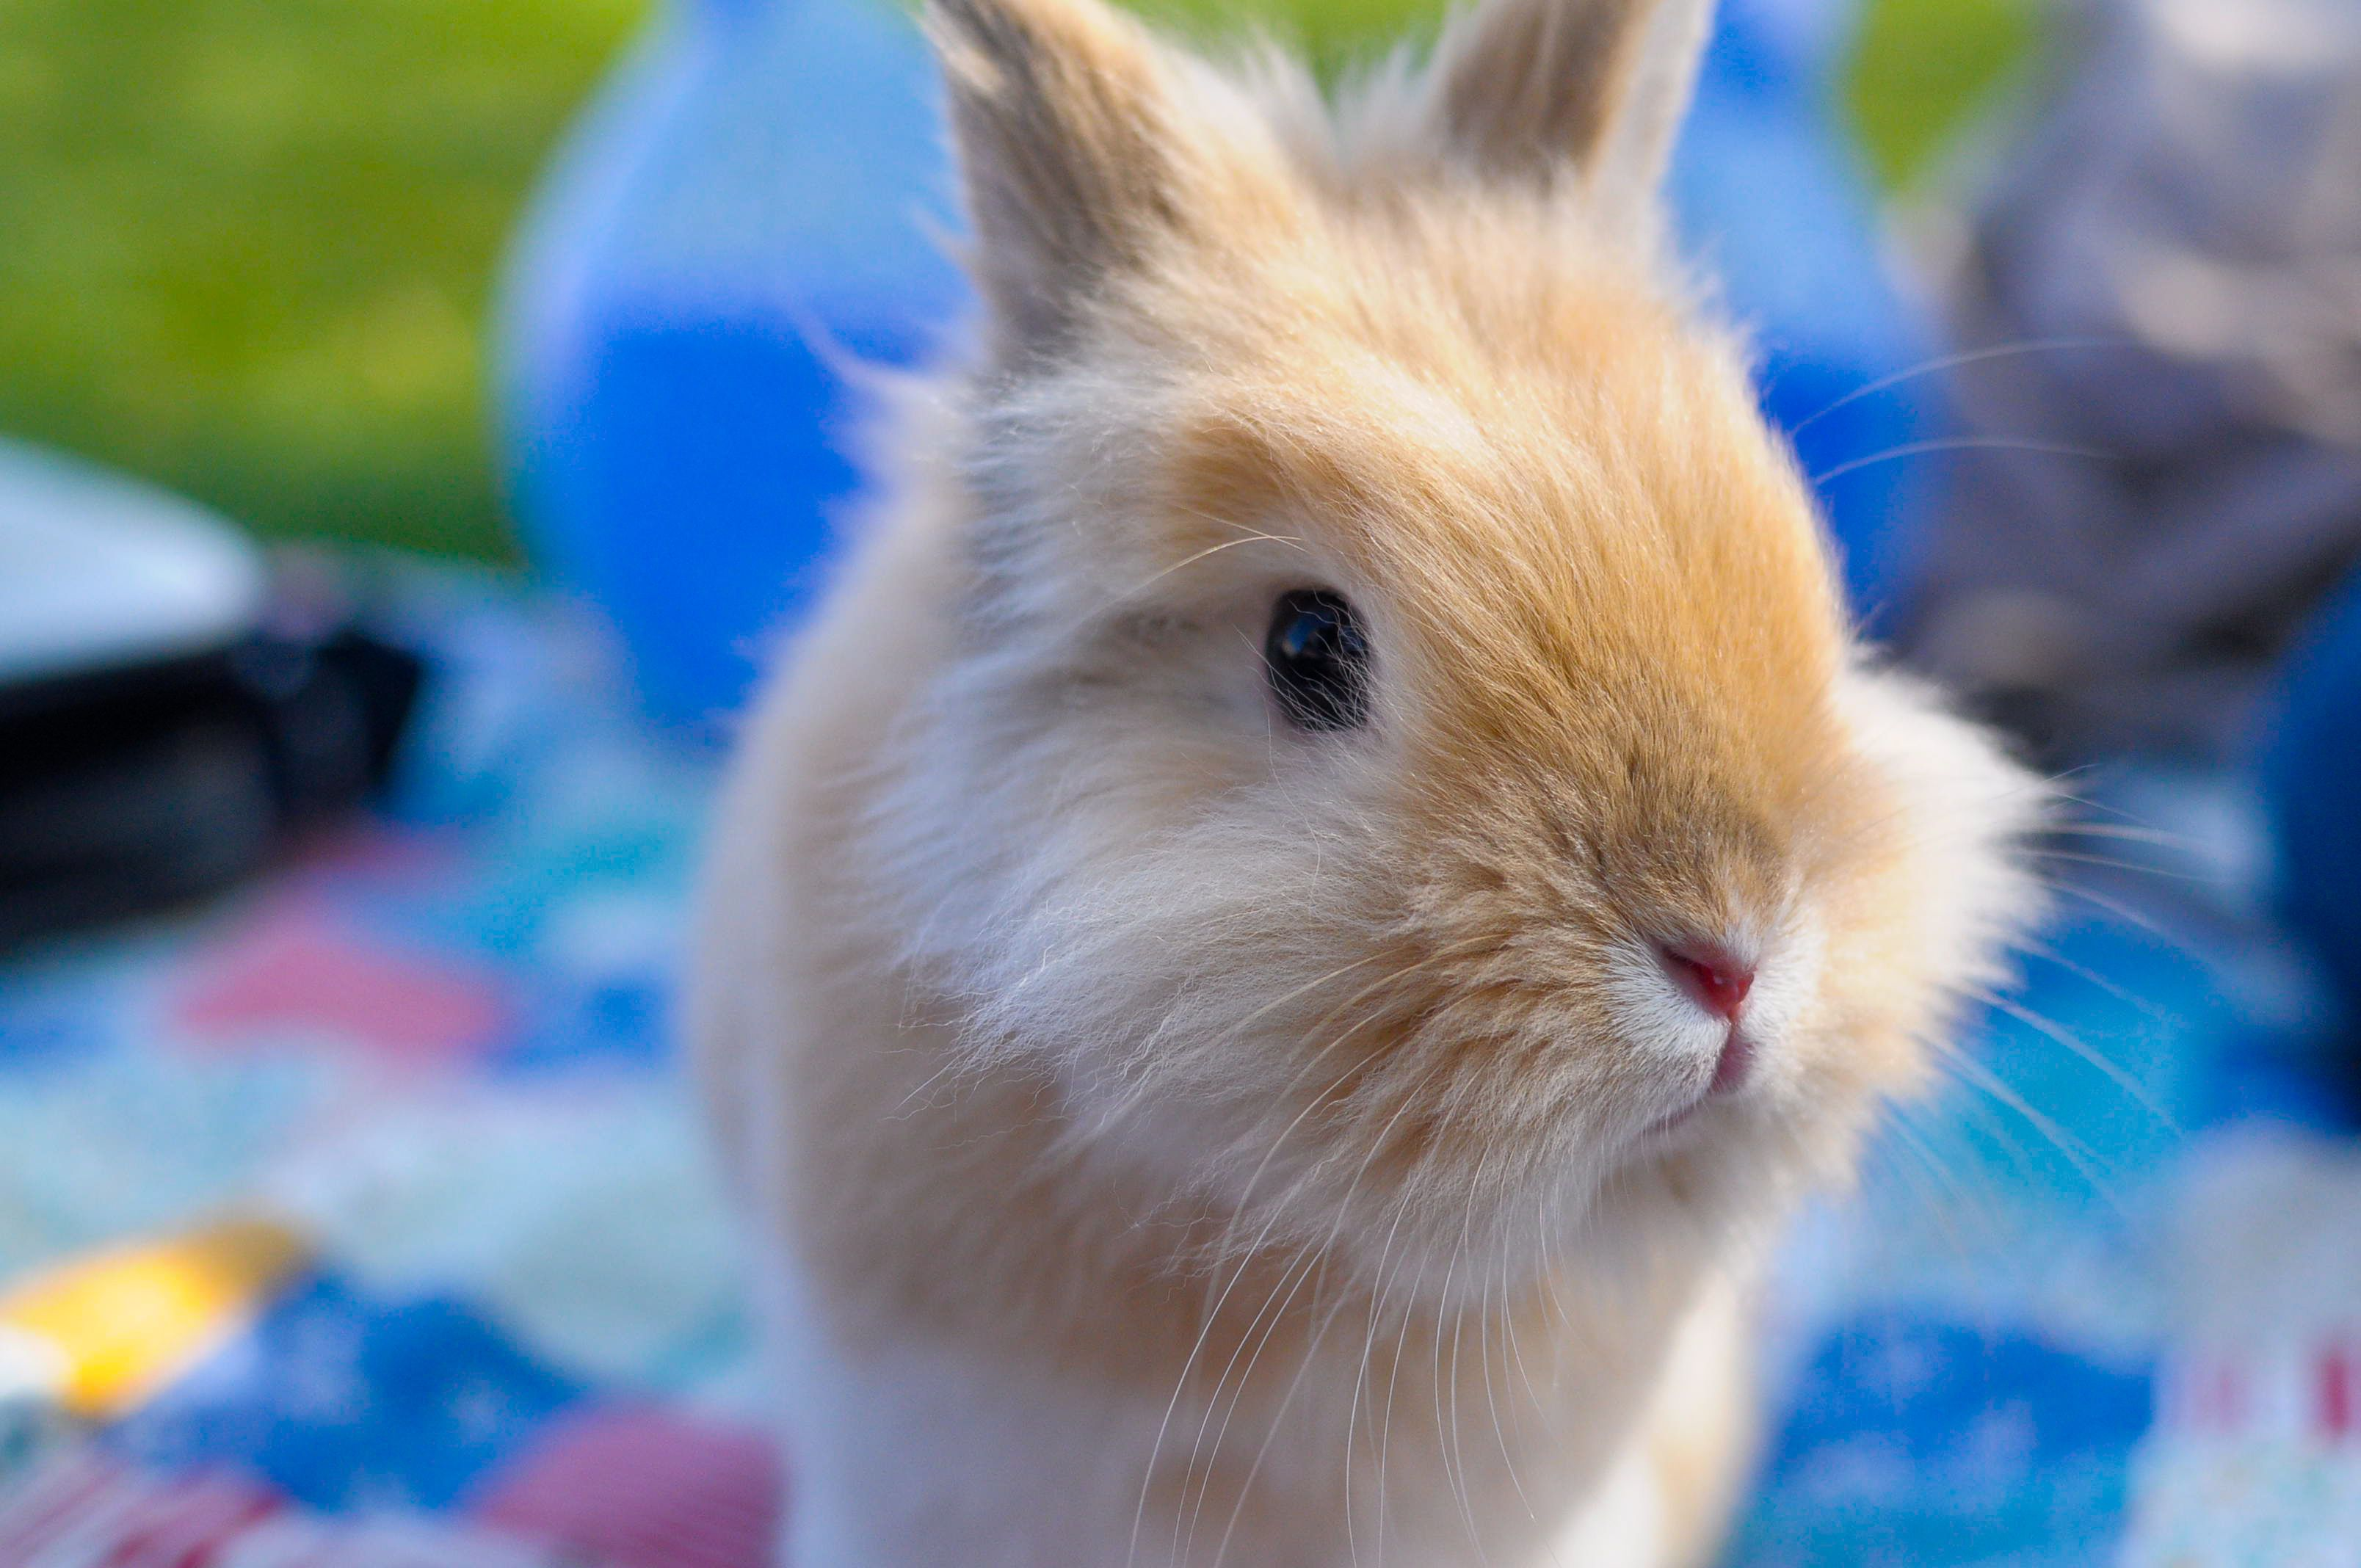 Head Tilt in Rabbits- Rabbit Head Tilt Causes